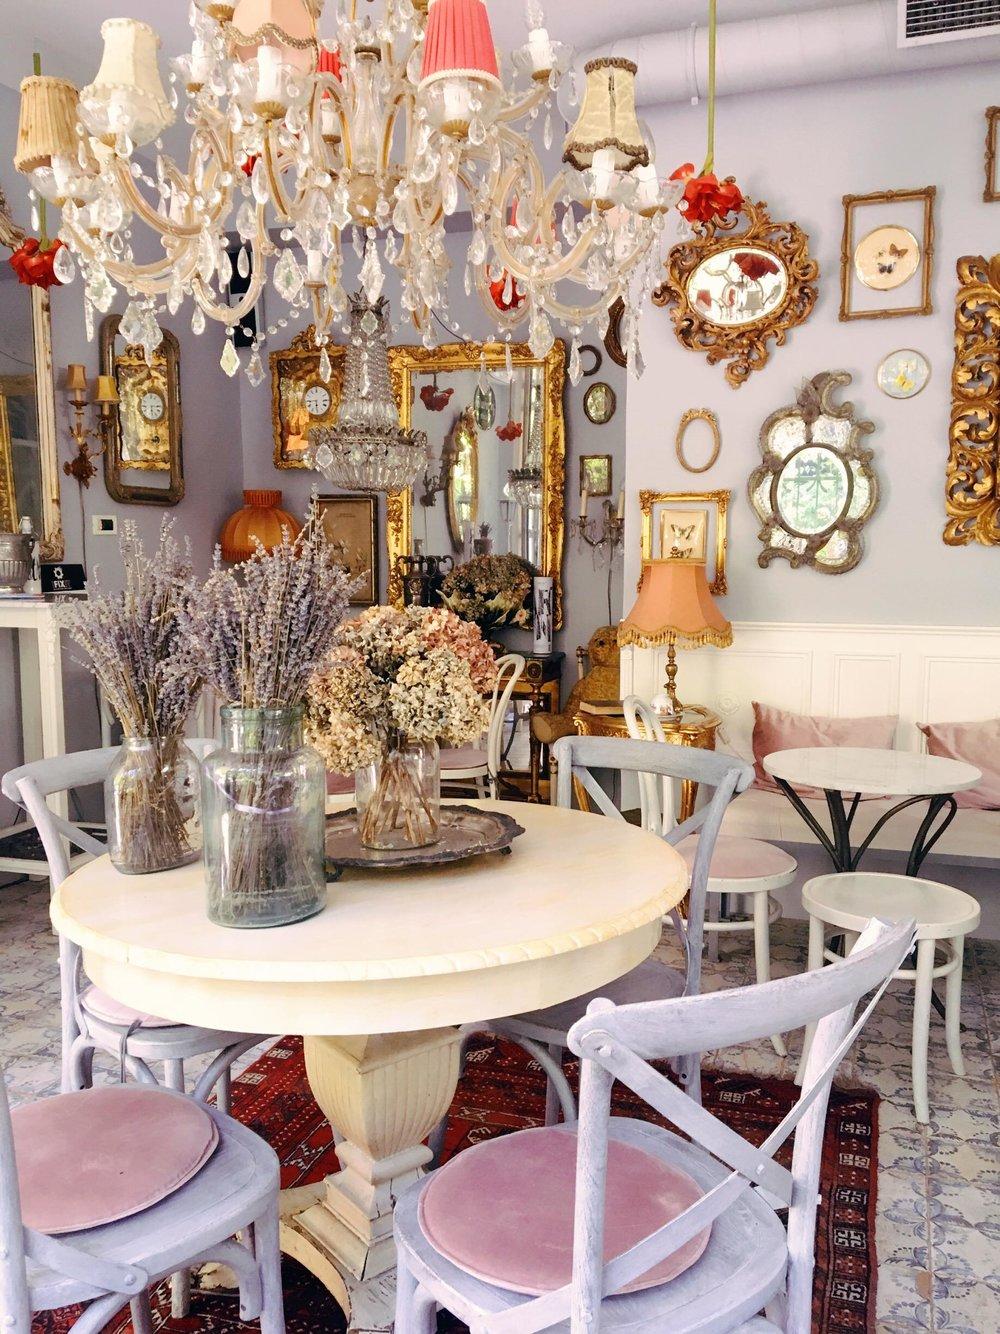 Caffe Bar Finjak | Beautiful Cafe | jumpseatjenny | Zagreb Croatia.jpg